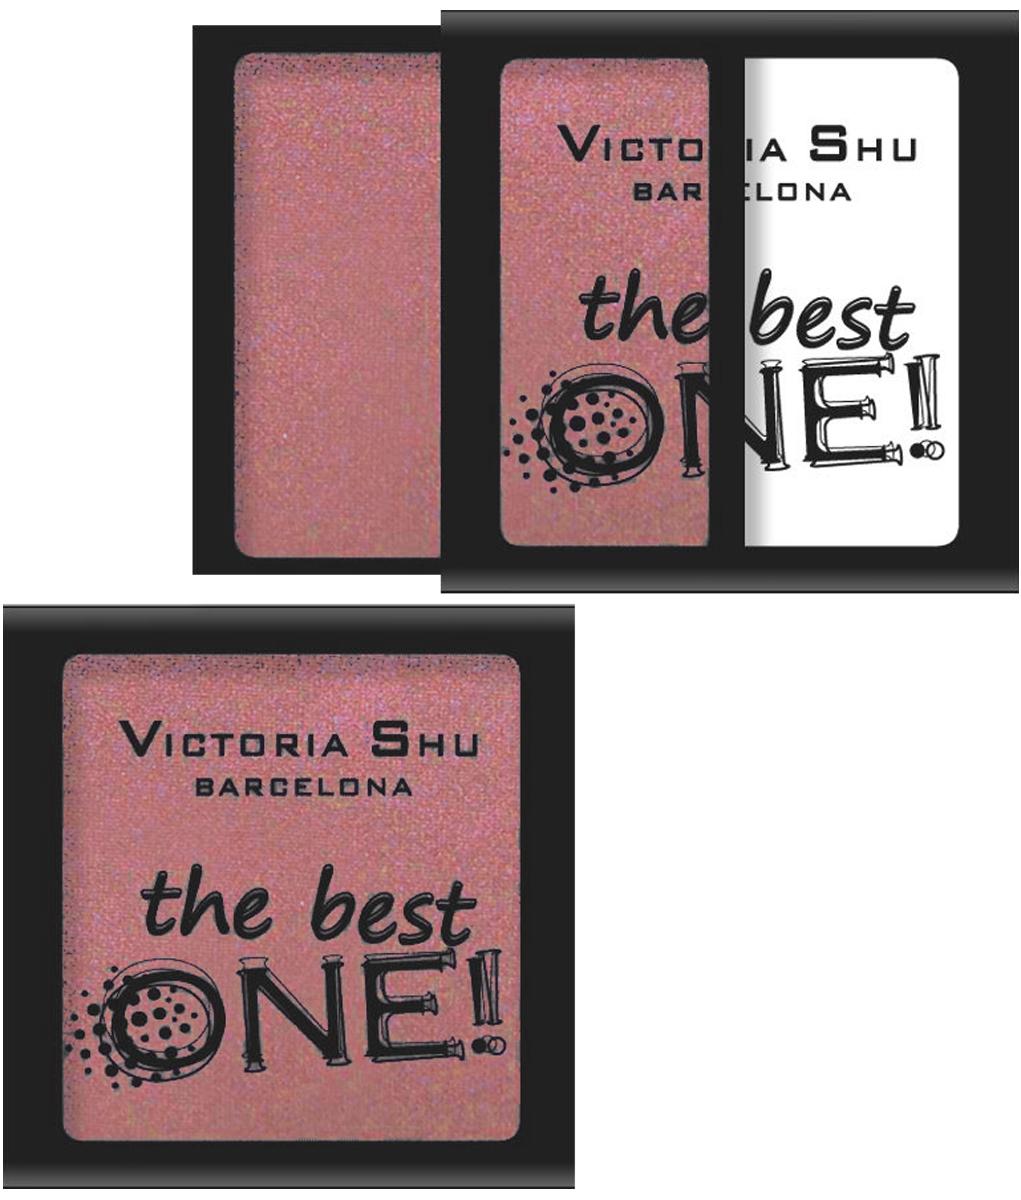 Victoria Shu Румяна The Best One №13, 2.3г румяна victoria shu the best one 14 цвет 14 пастельный variant hex name b97f73